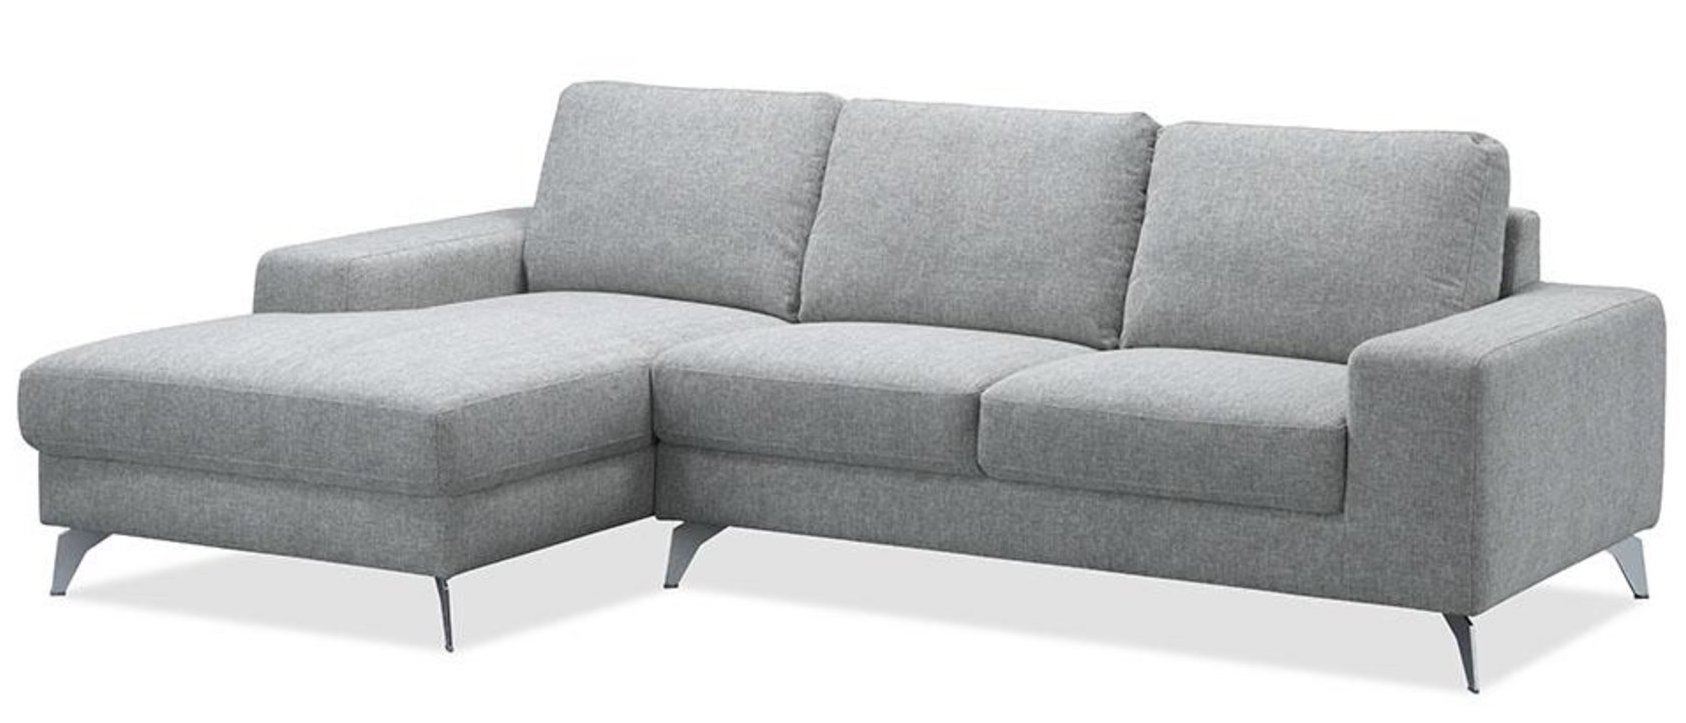 canap angle gauche tissu gris clair sinka. Black Bedroom Furniture Sets. Home Design Ideas